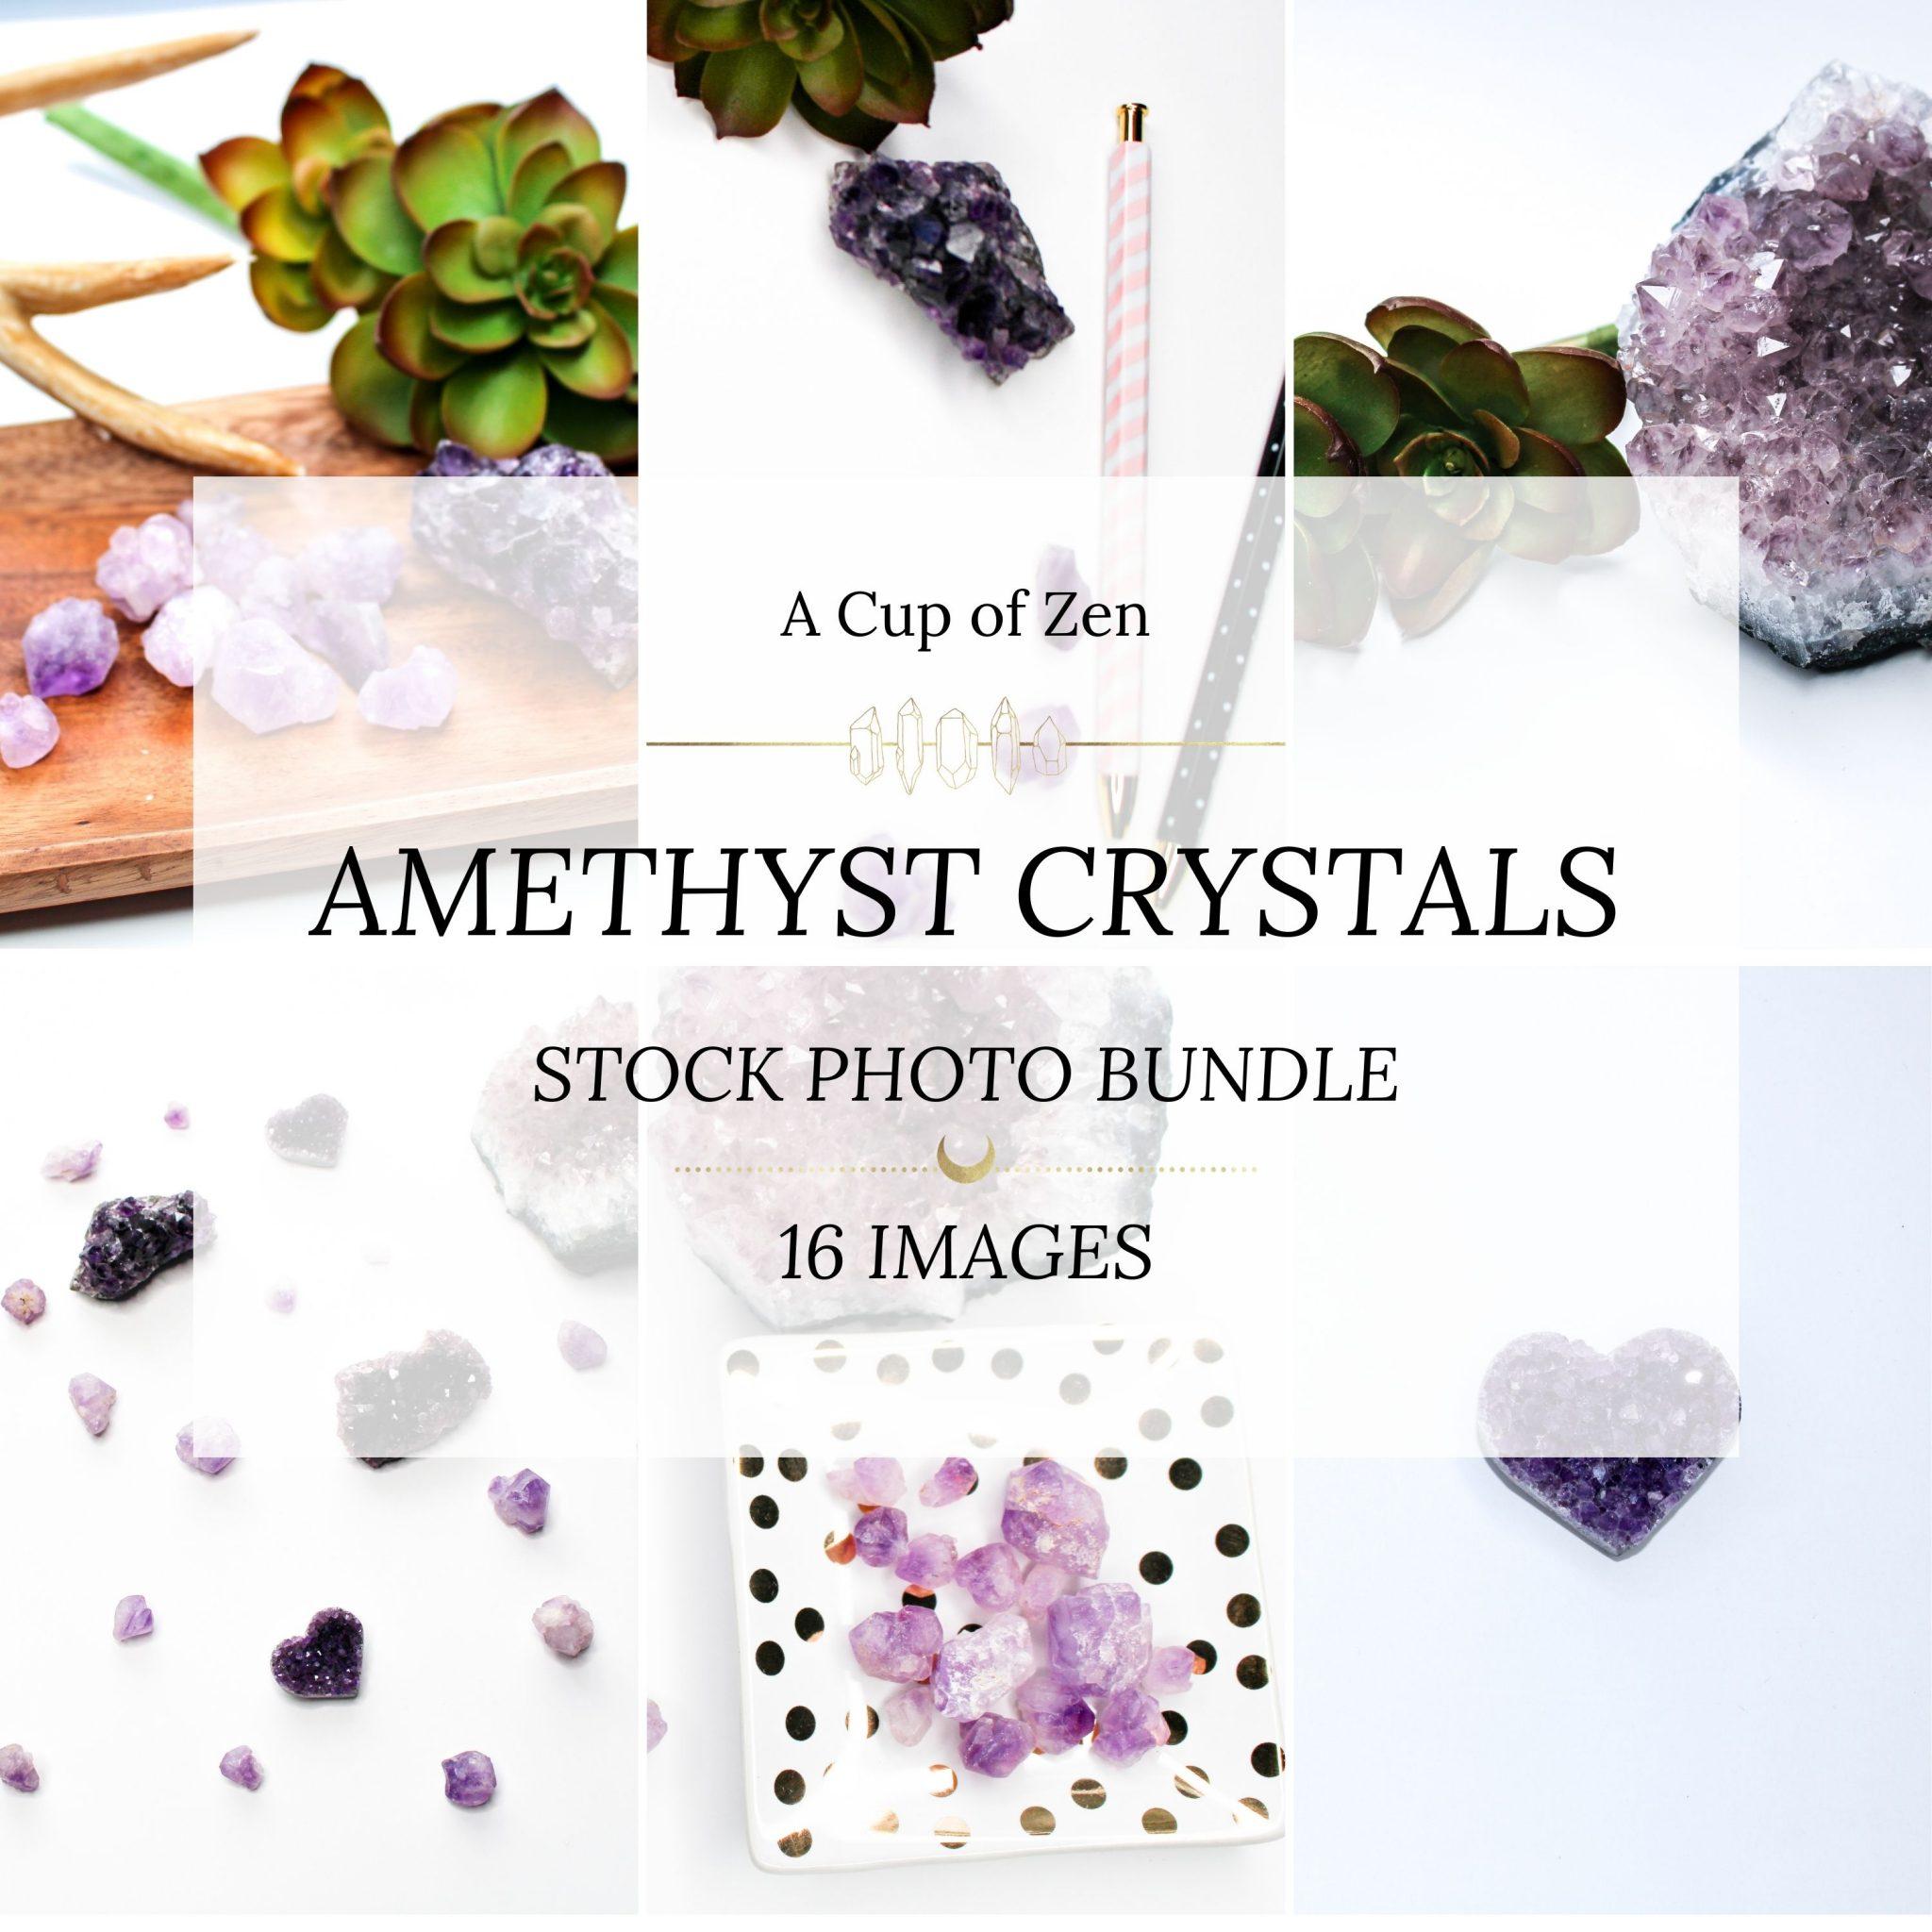 amethyst crystals stock photos